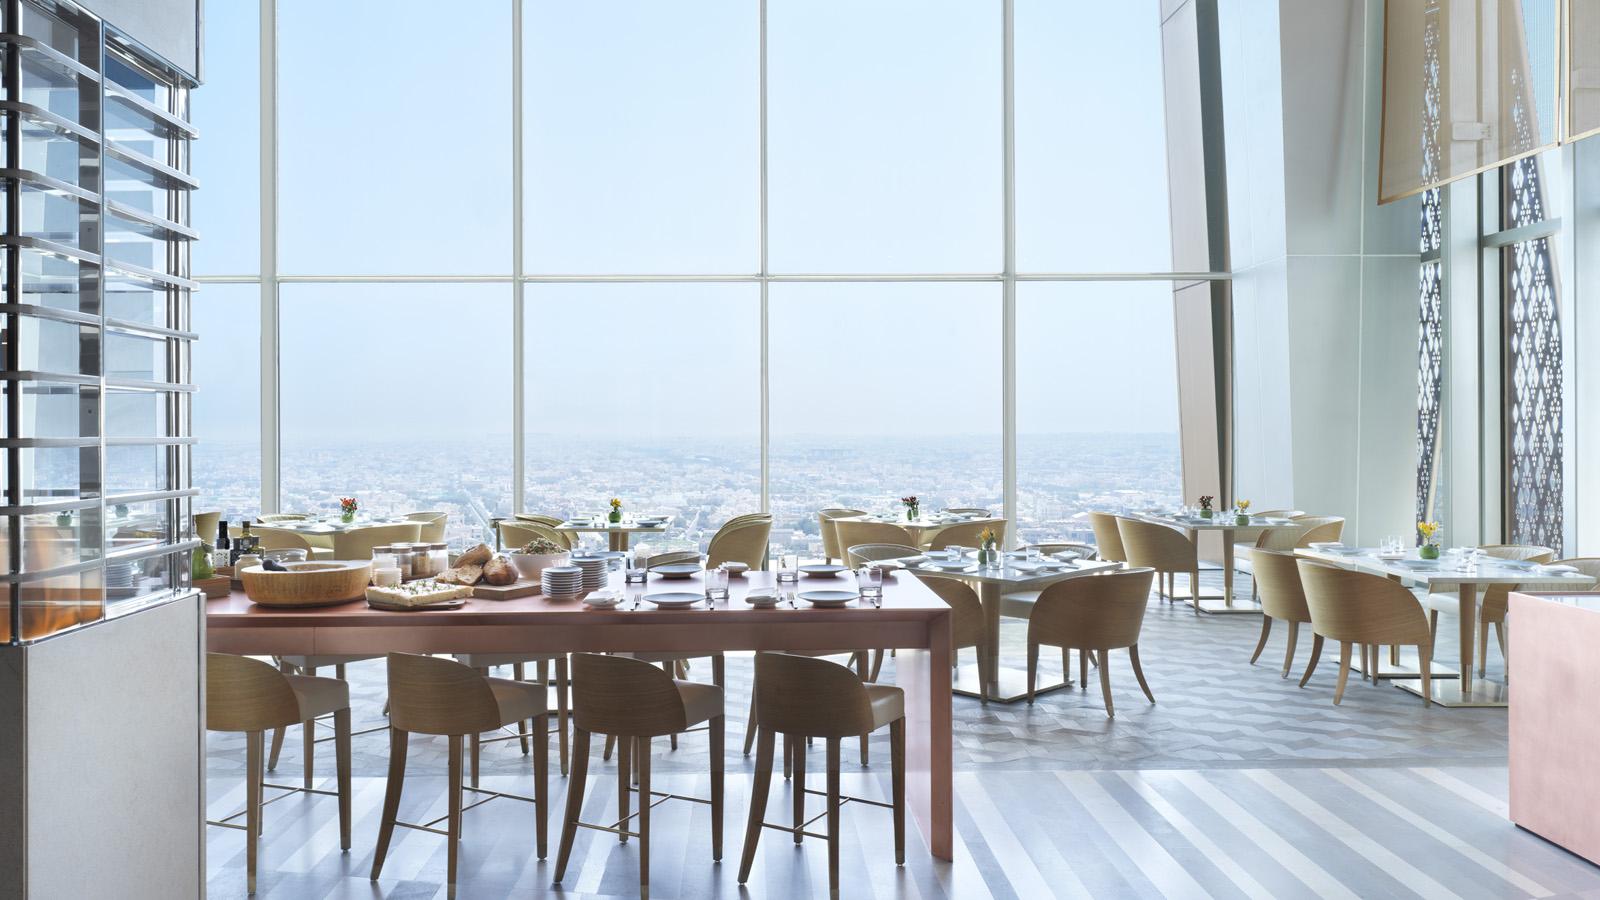 Design Notes: Four Seasons Hotel Kuwait at Burj Alshaya